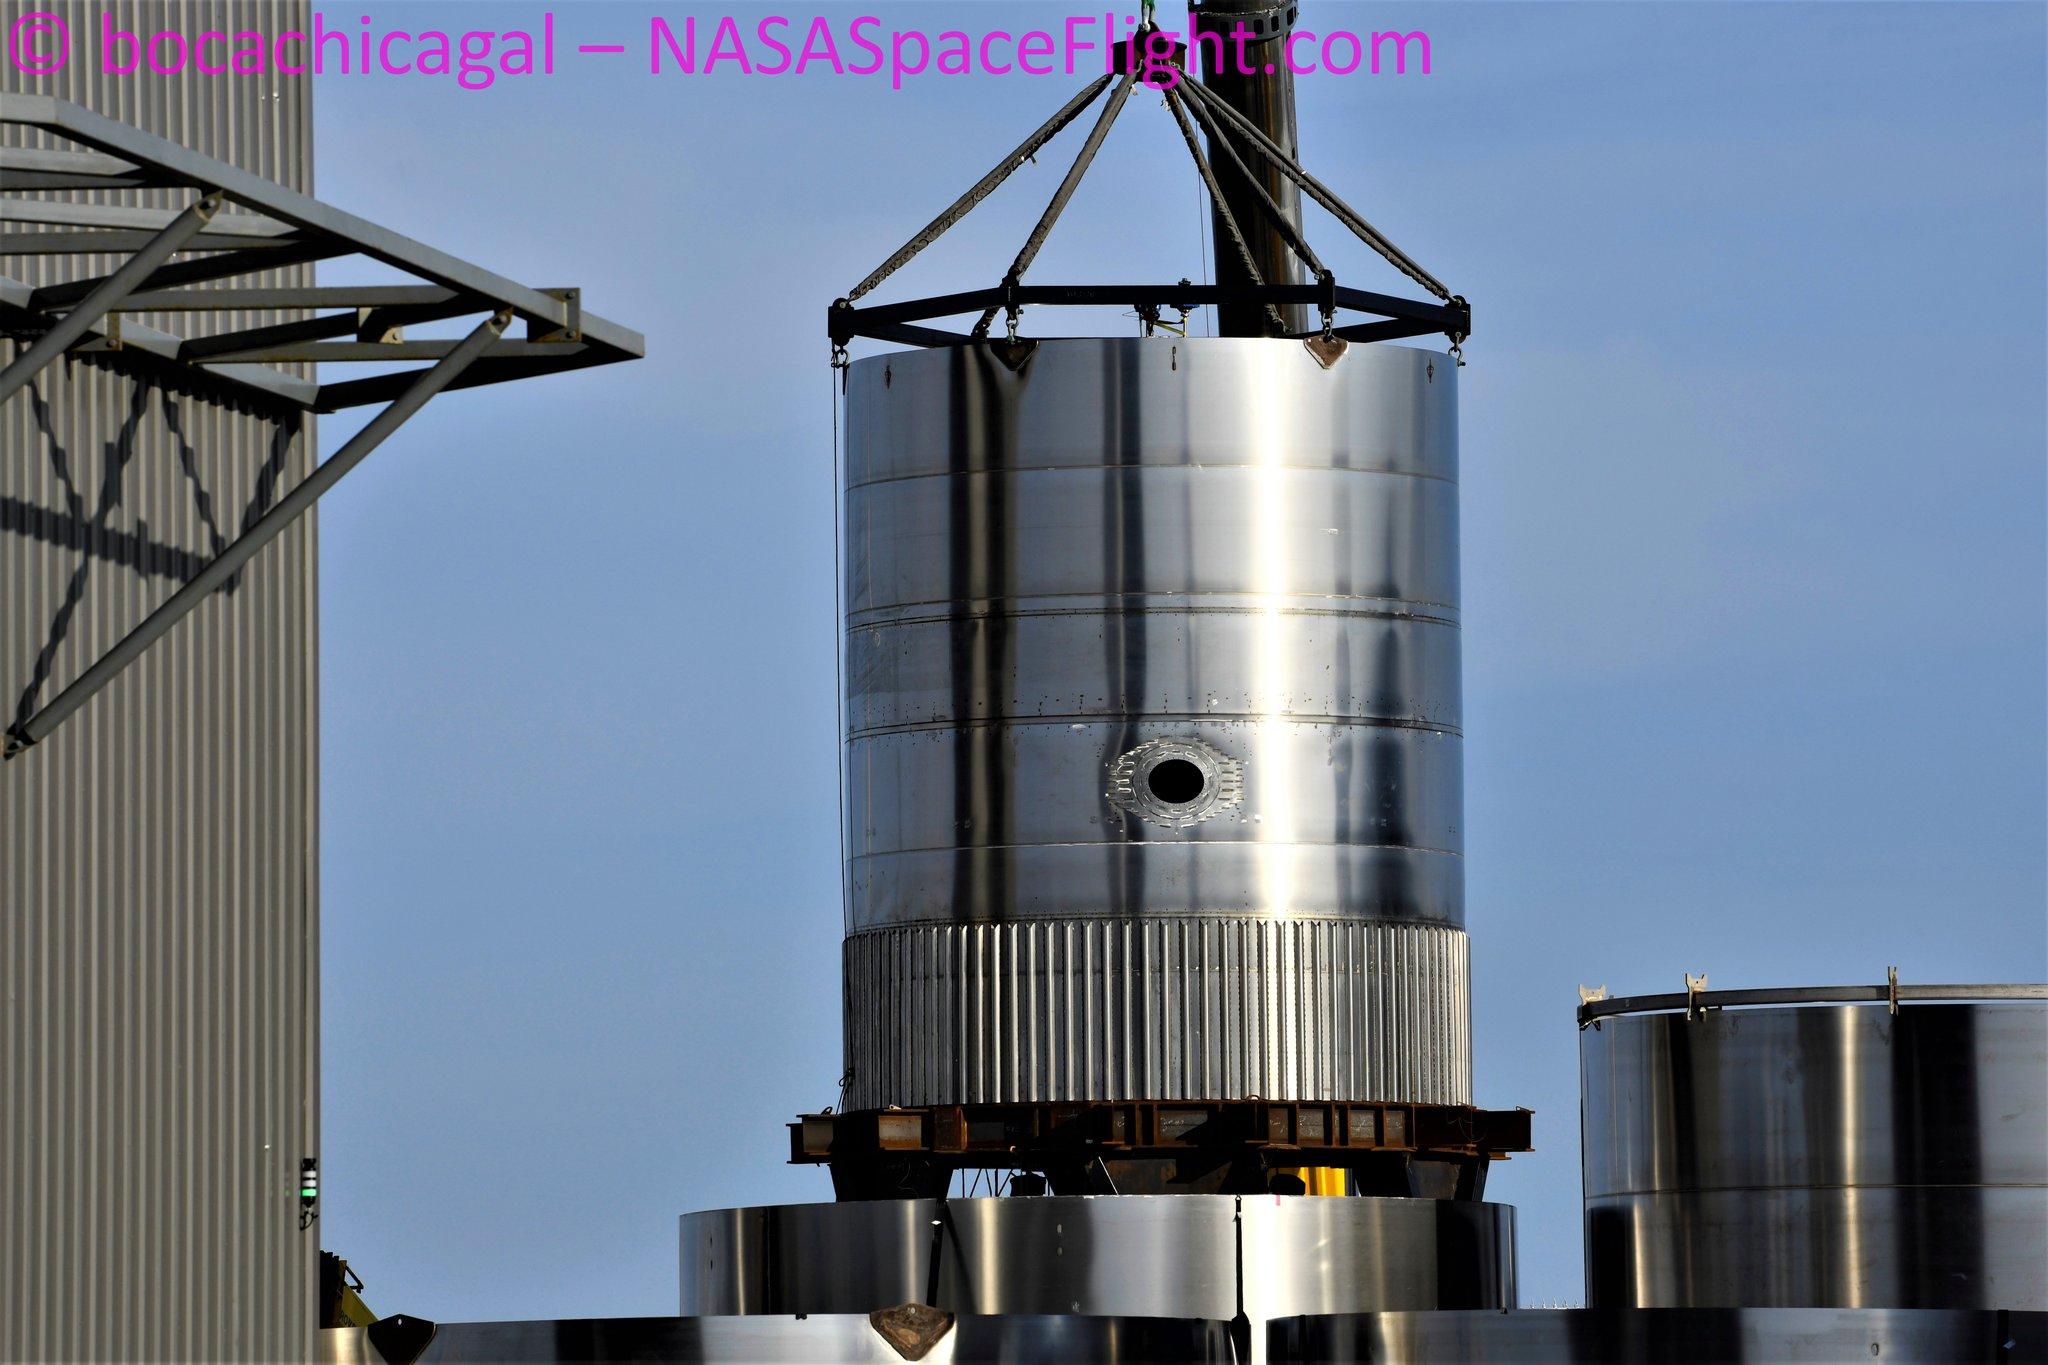 BN2.1 (Réservoir de test Super Heavy) E2yqWdyWYAMVvB0?format=jpg&name=large